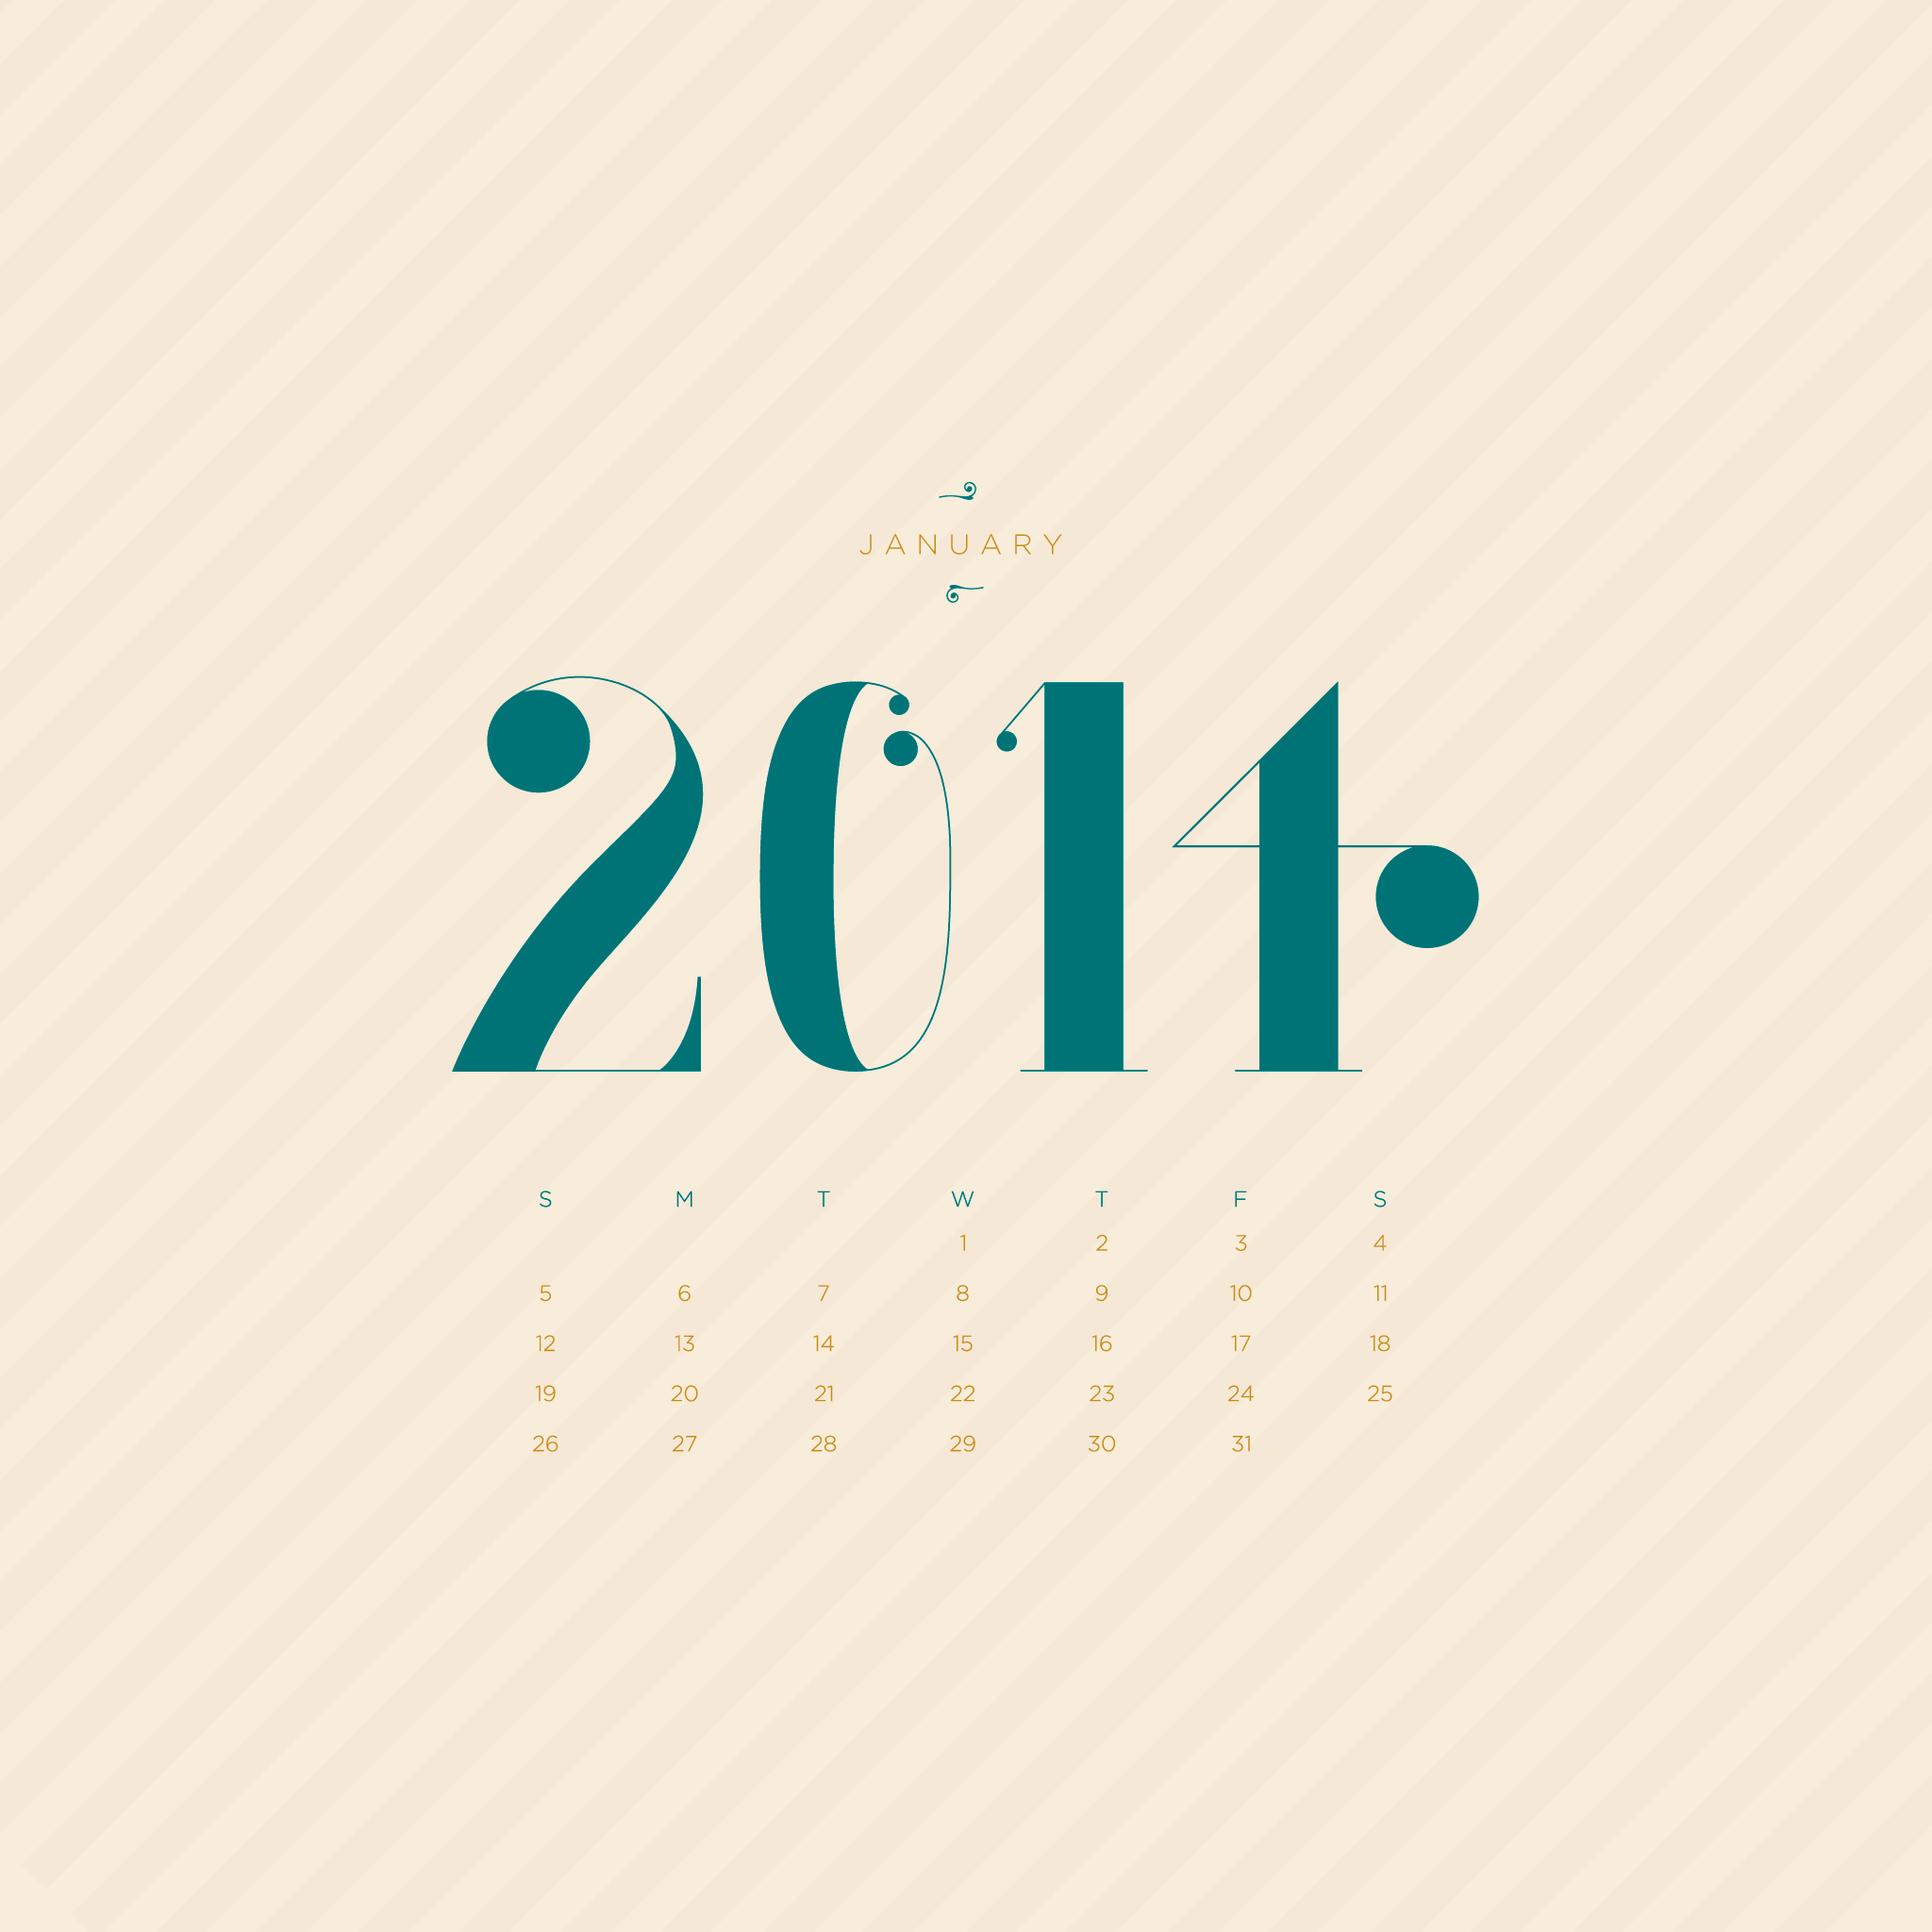 January Desktop Calendar Wallpaper